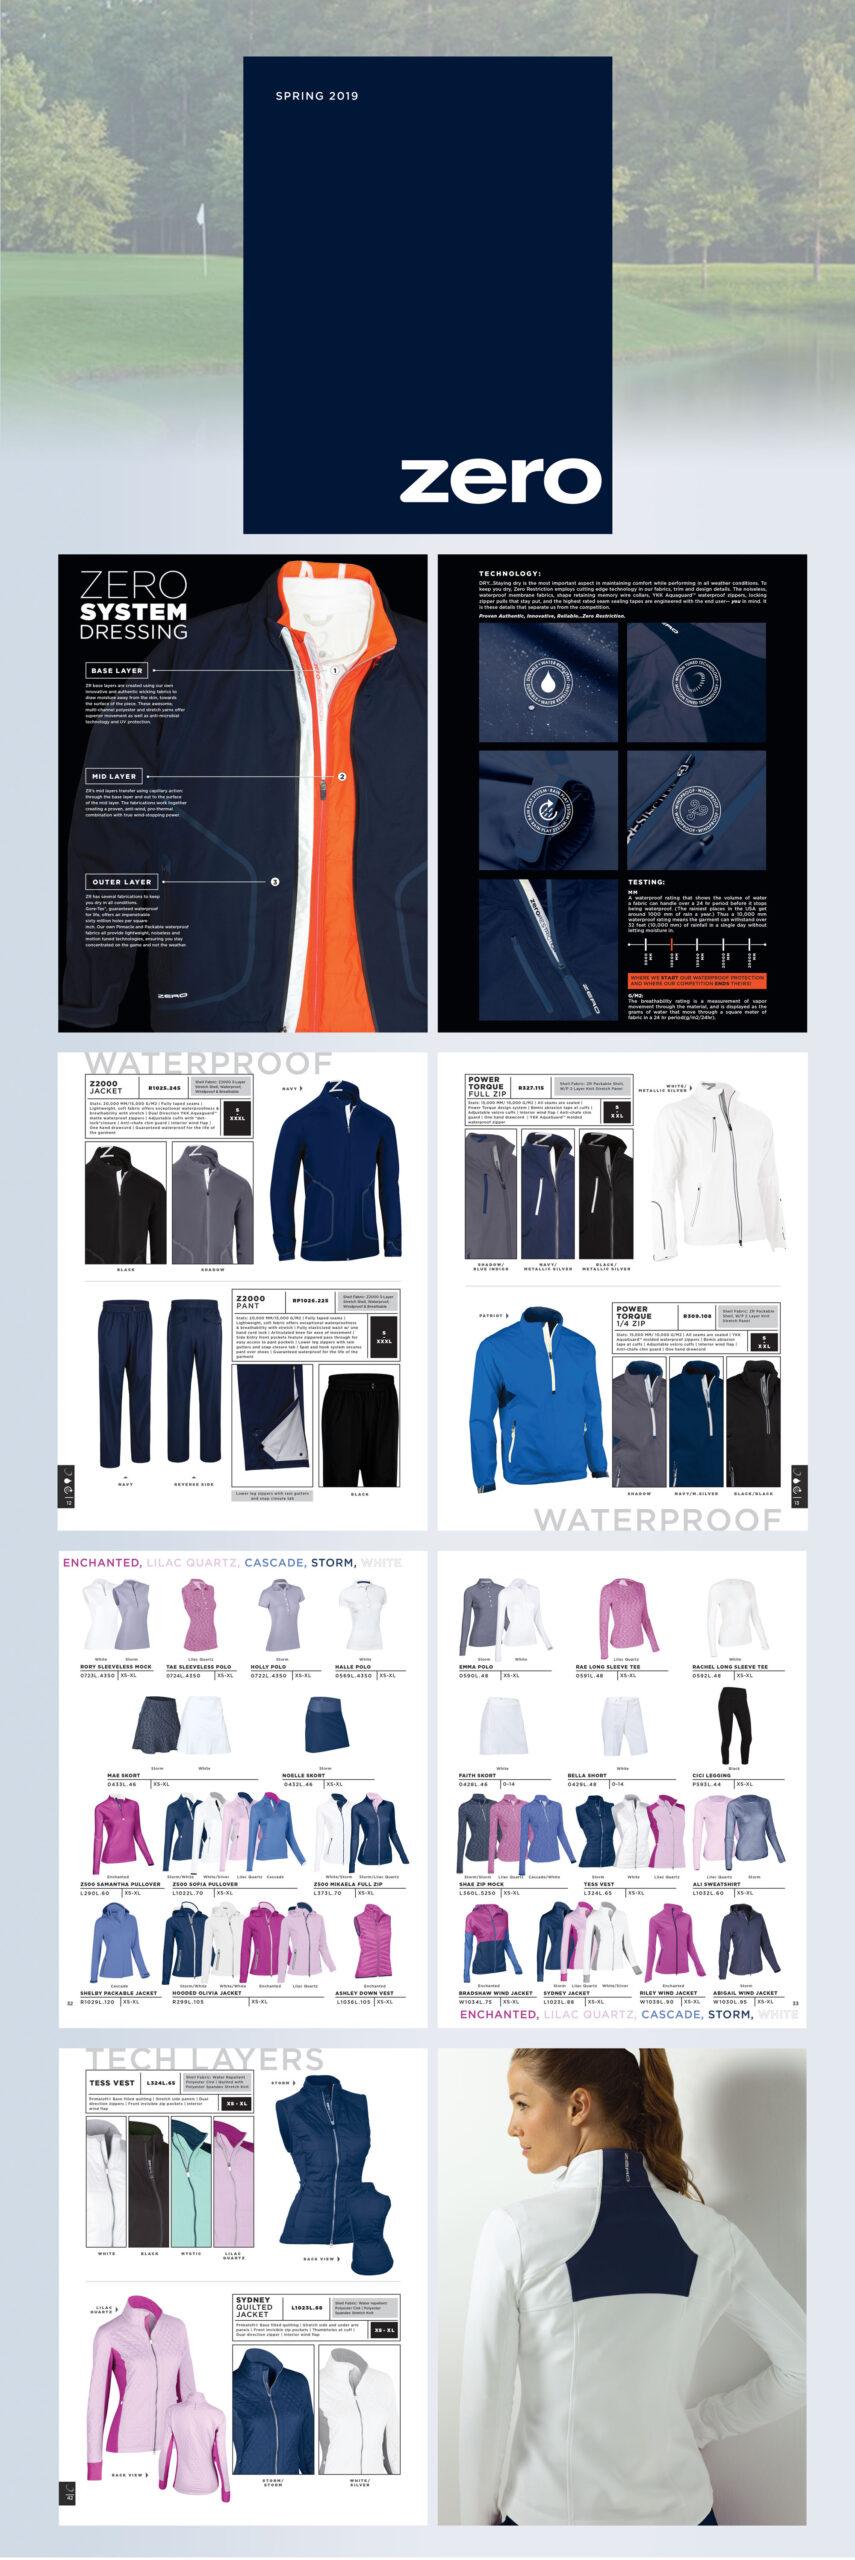 layout portfolio pictures for Zero Restriction golf apparel catalog